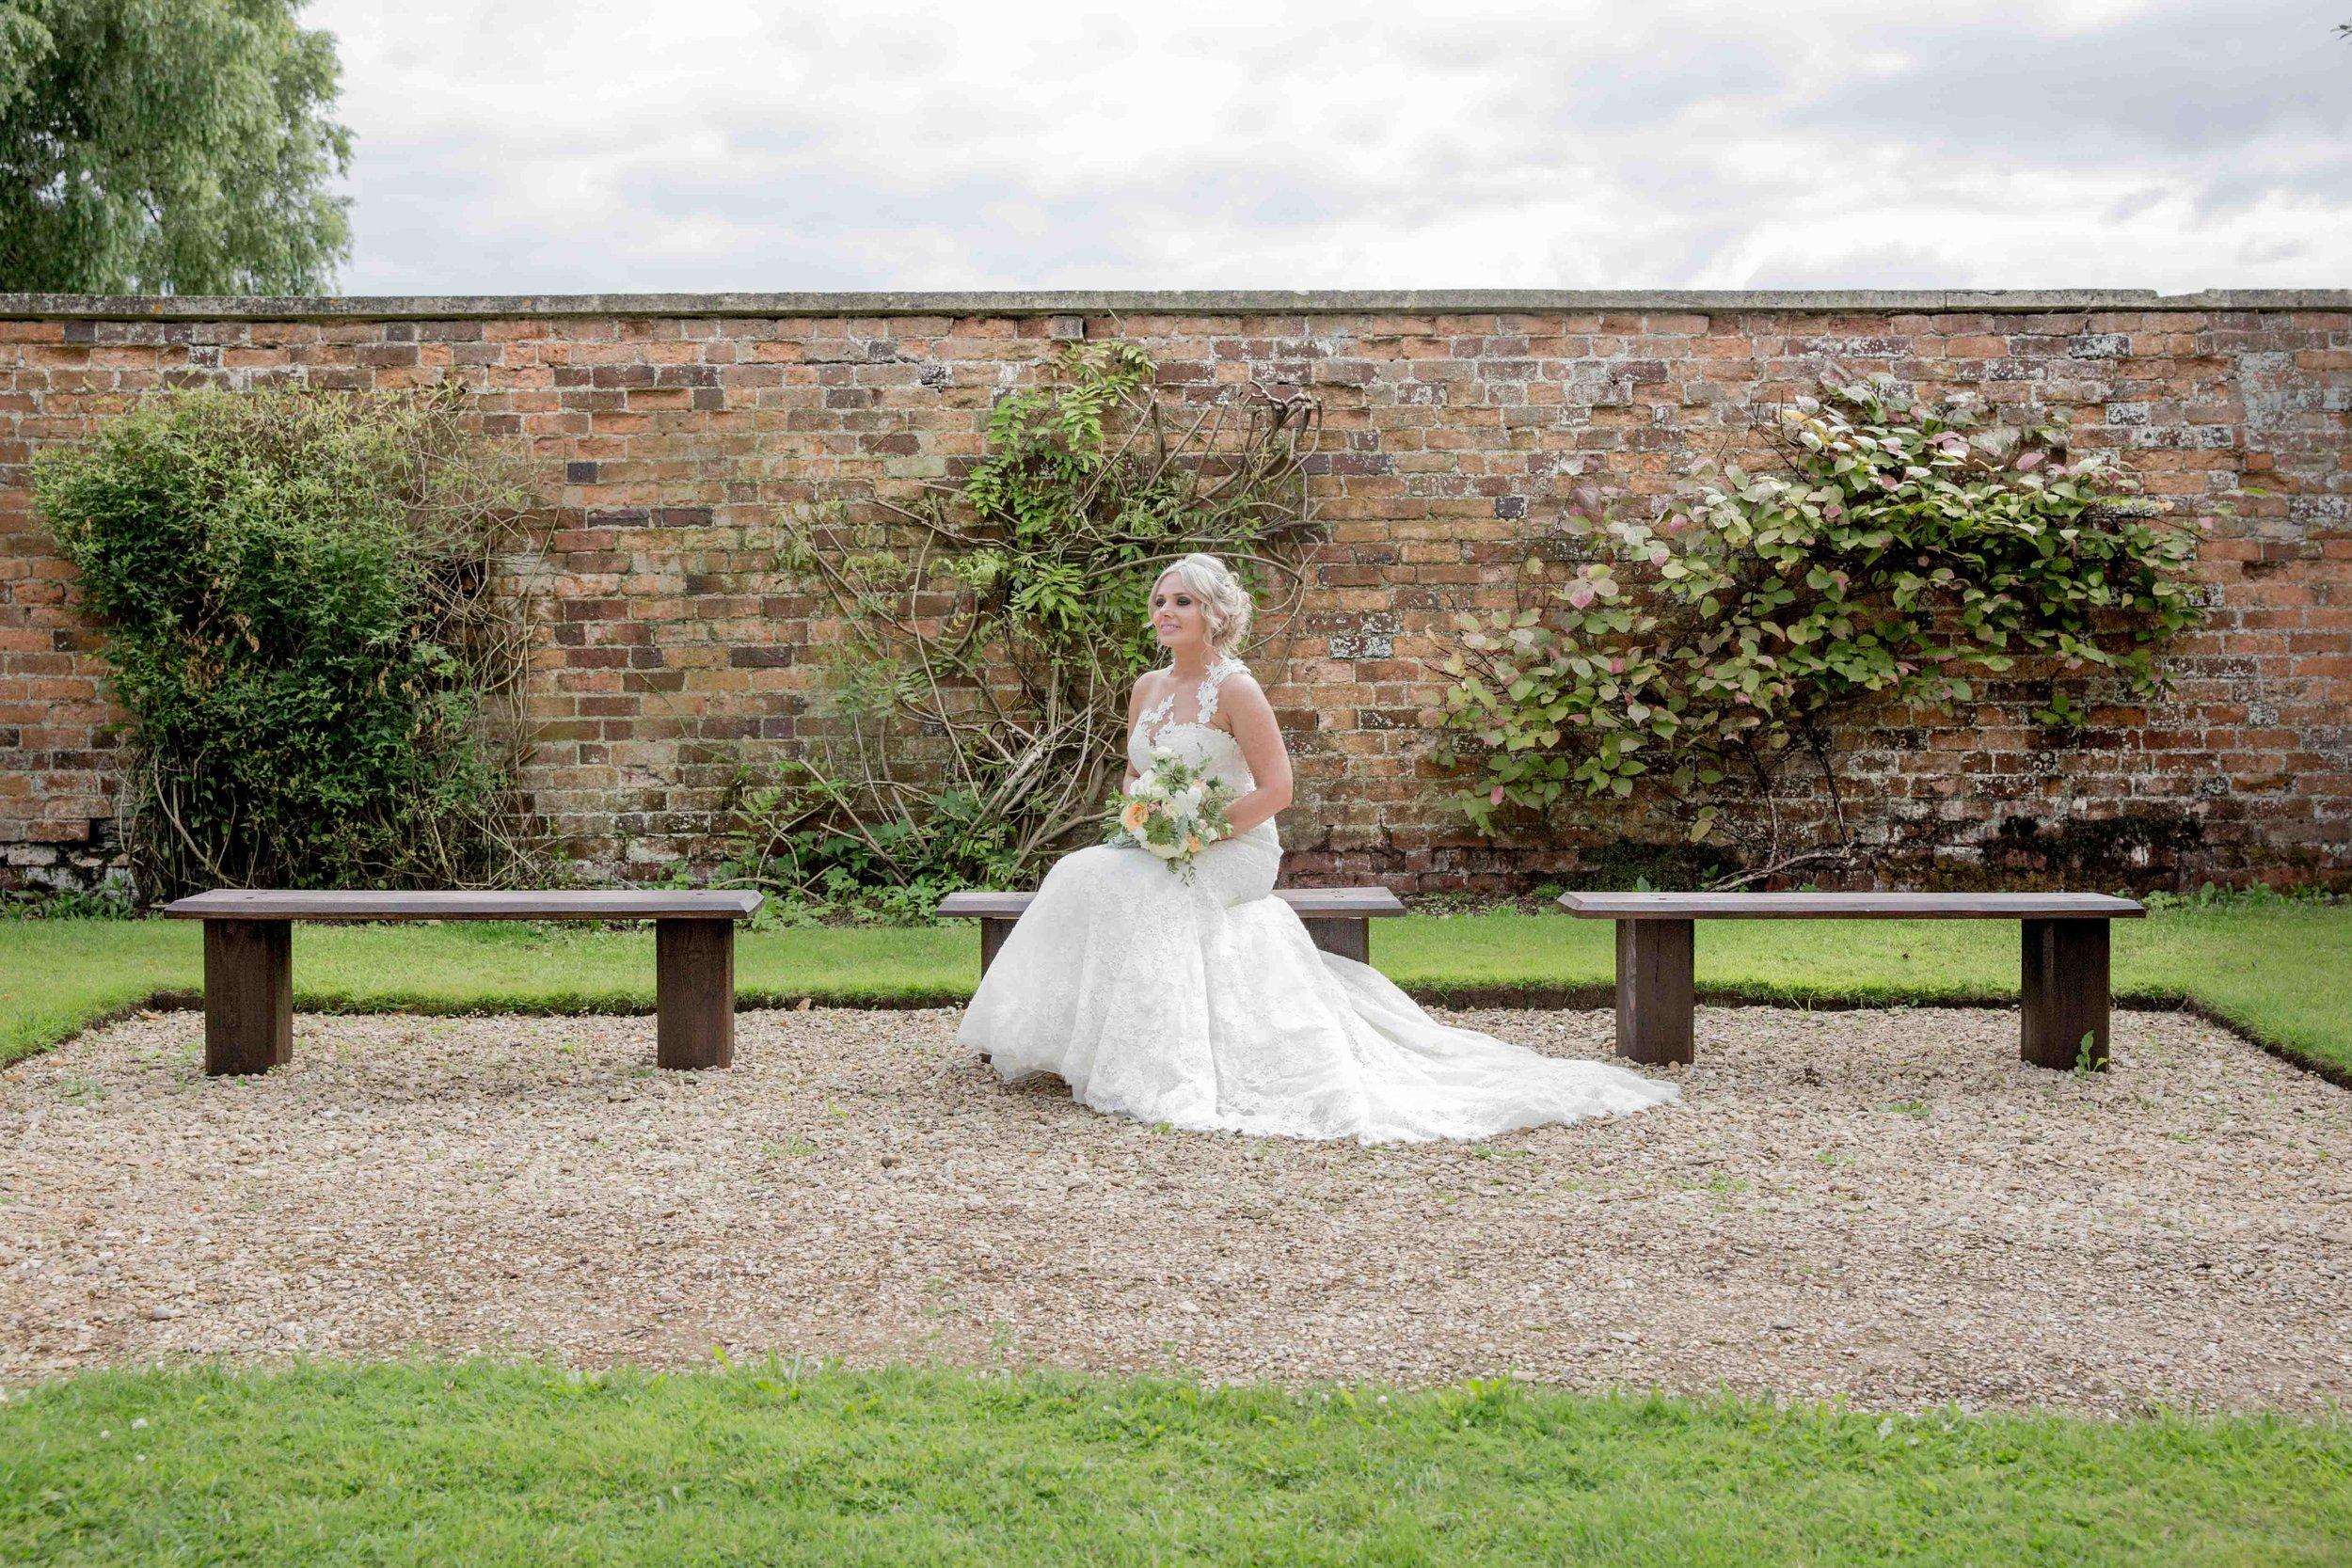 cotswold-wedding-photography-at-stonehouse-court-hotel-natalia-smith-photography-gloucestershire-wedding-photographer-63.jpg